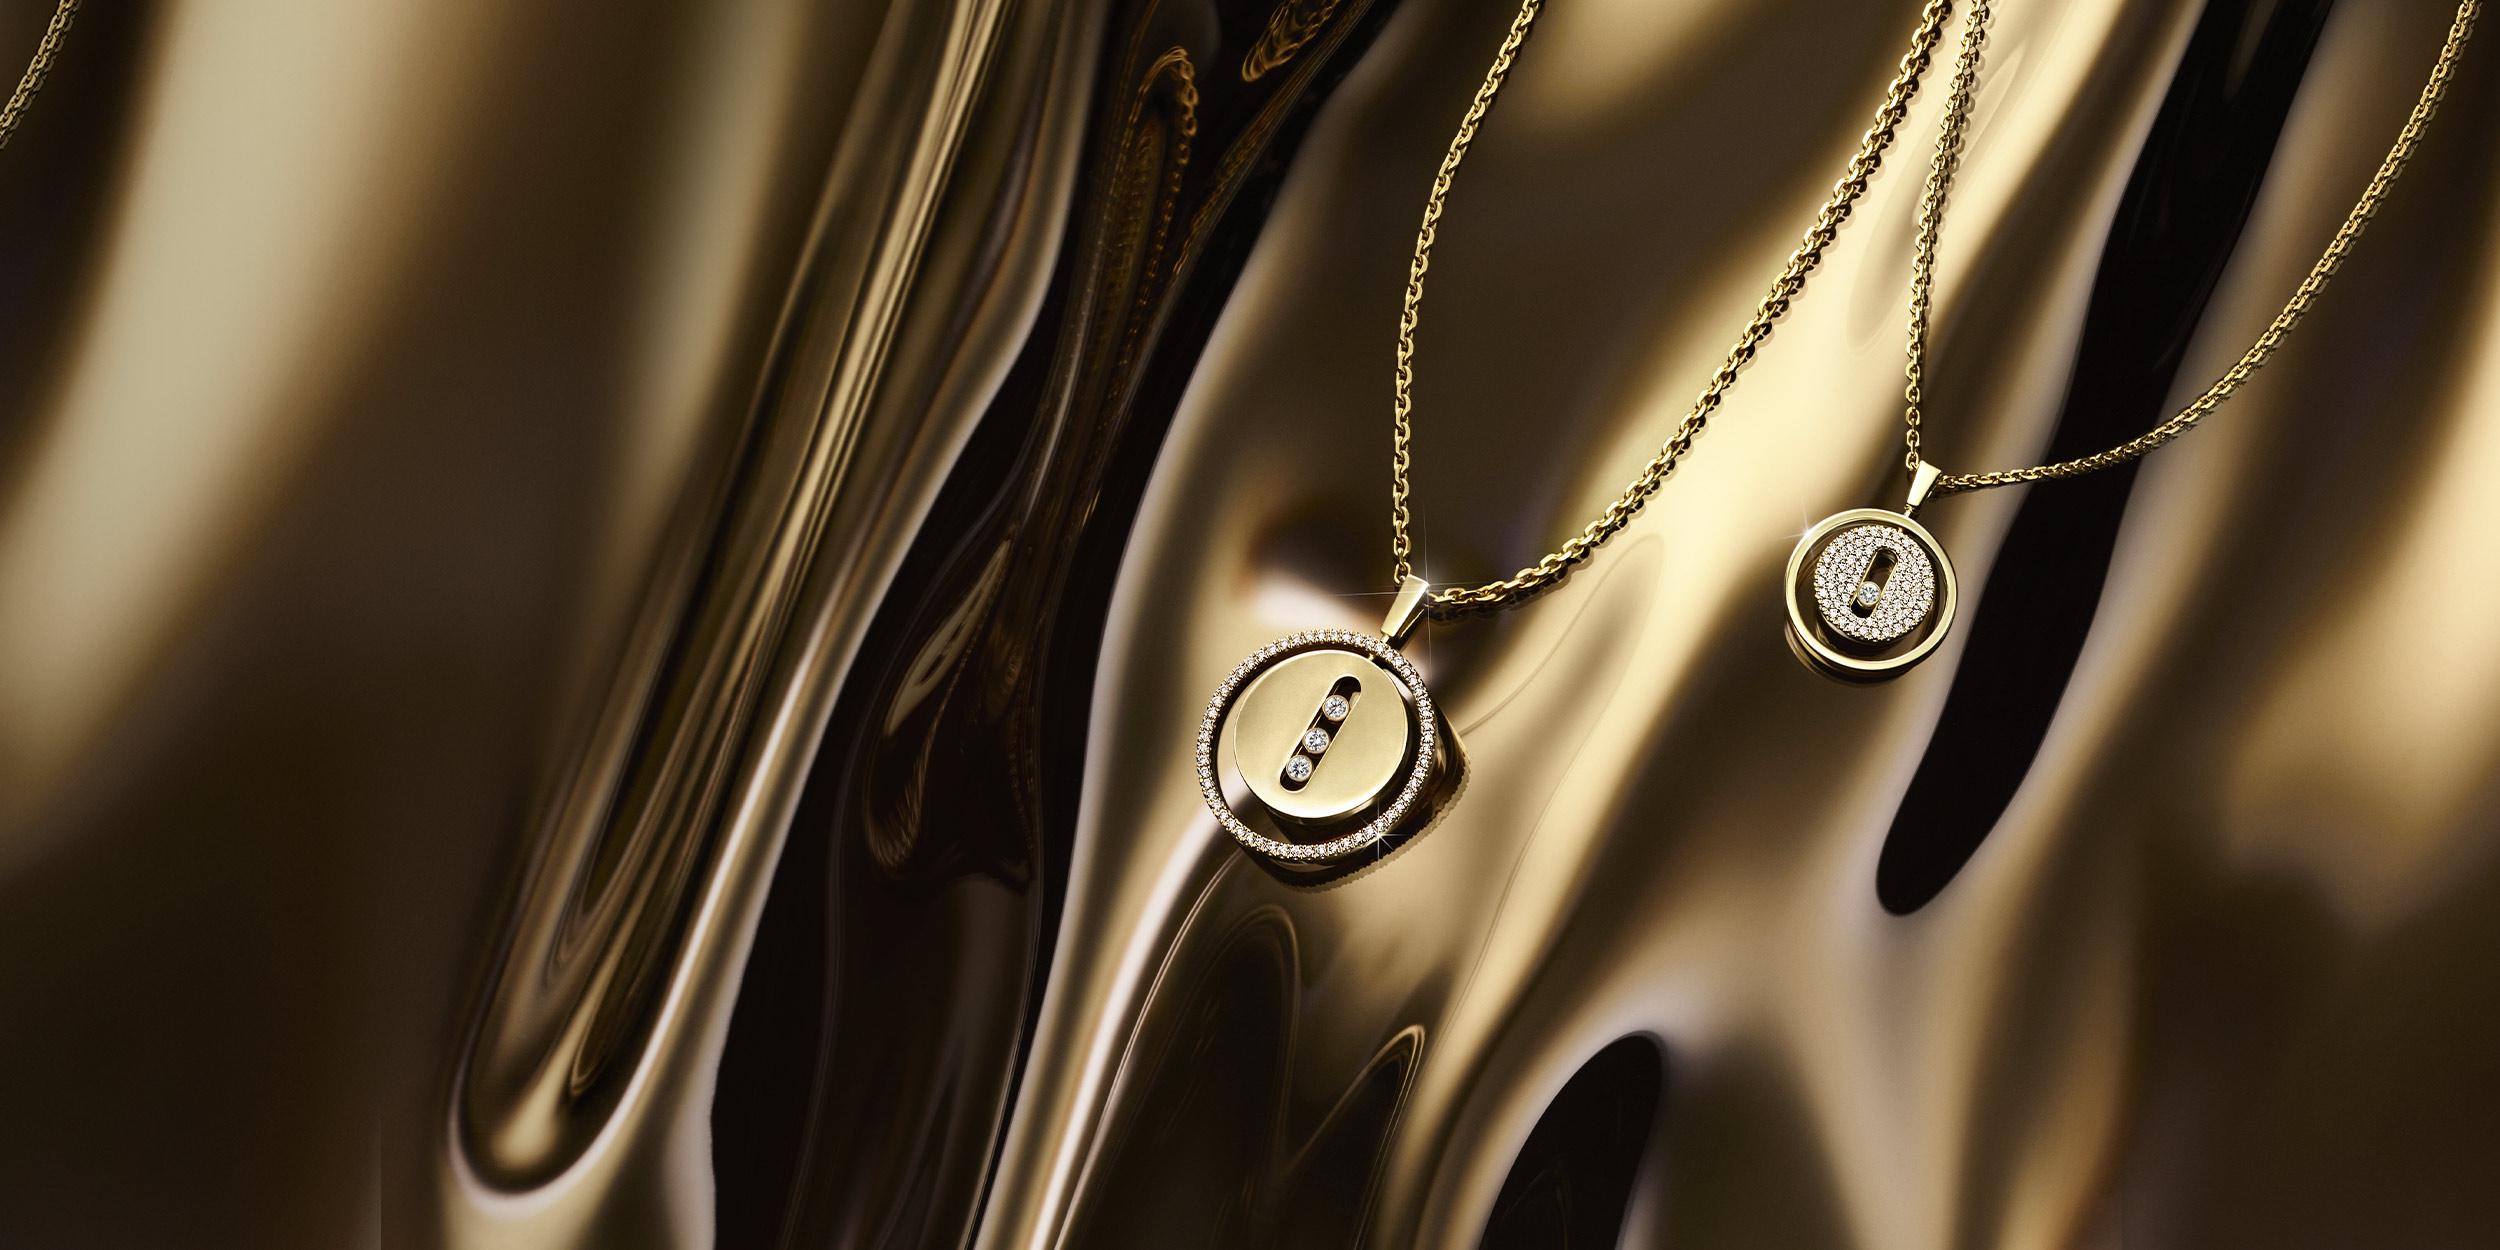 Luxury gold and diamond jewelry